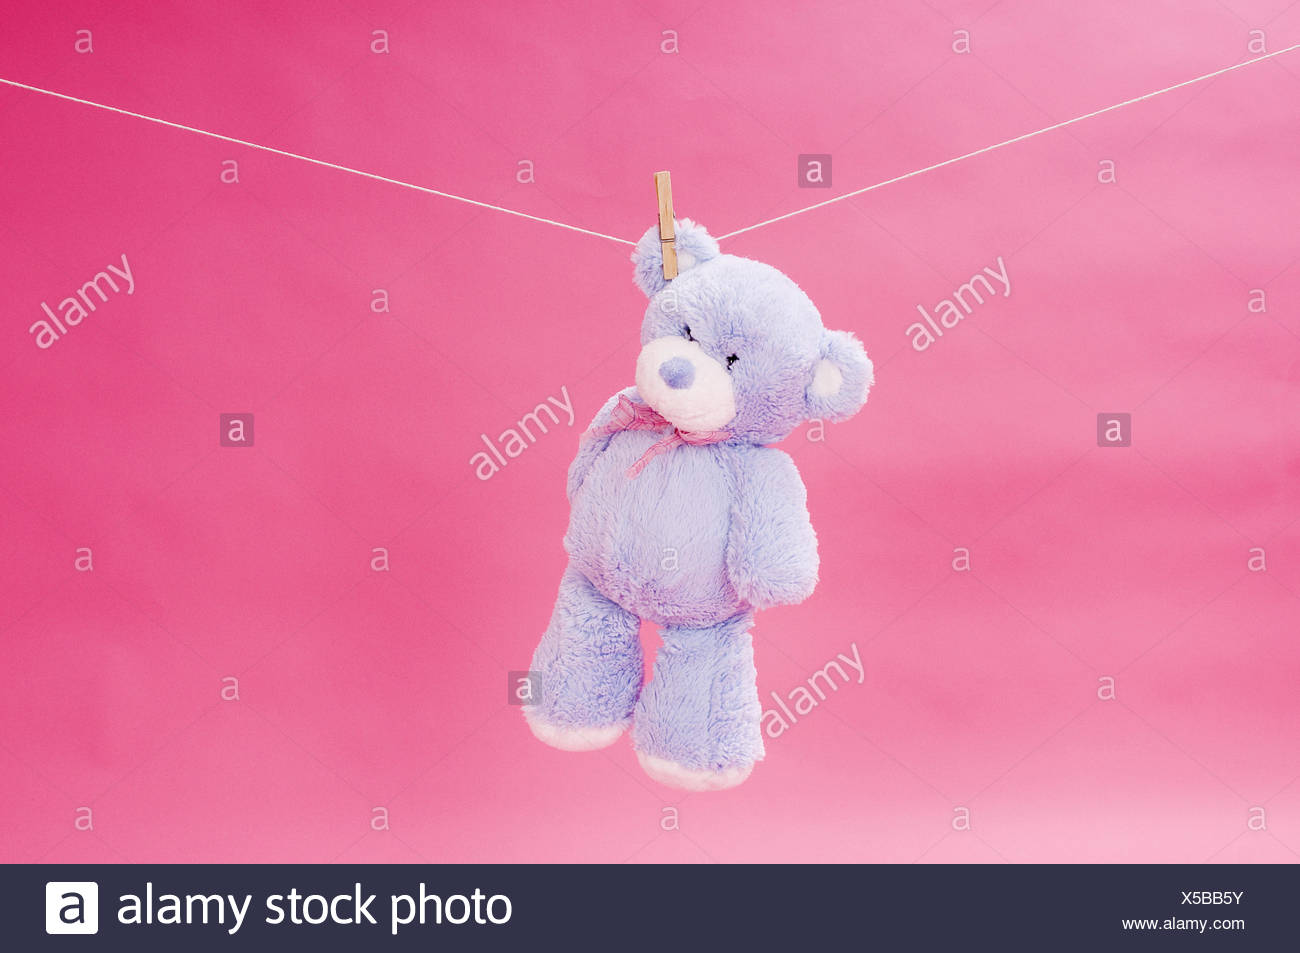 Substance bear, clothesline, hang, pink background, - Stock Image